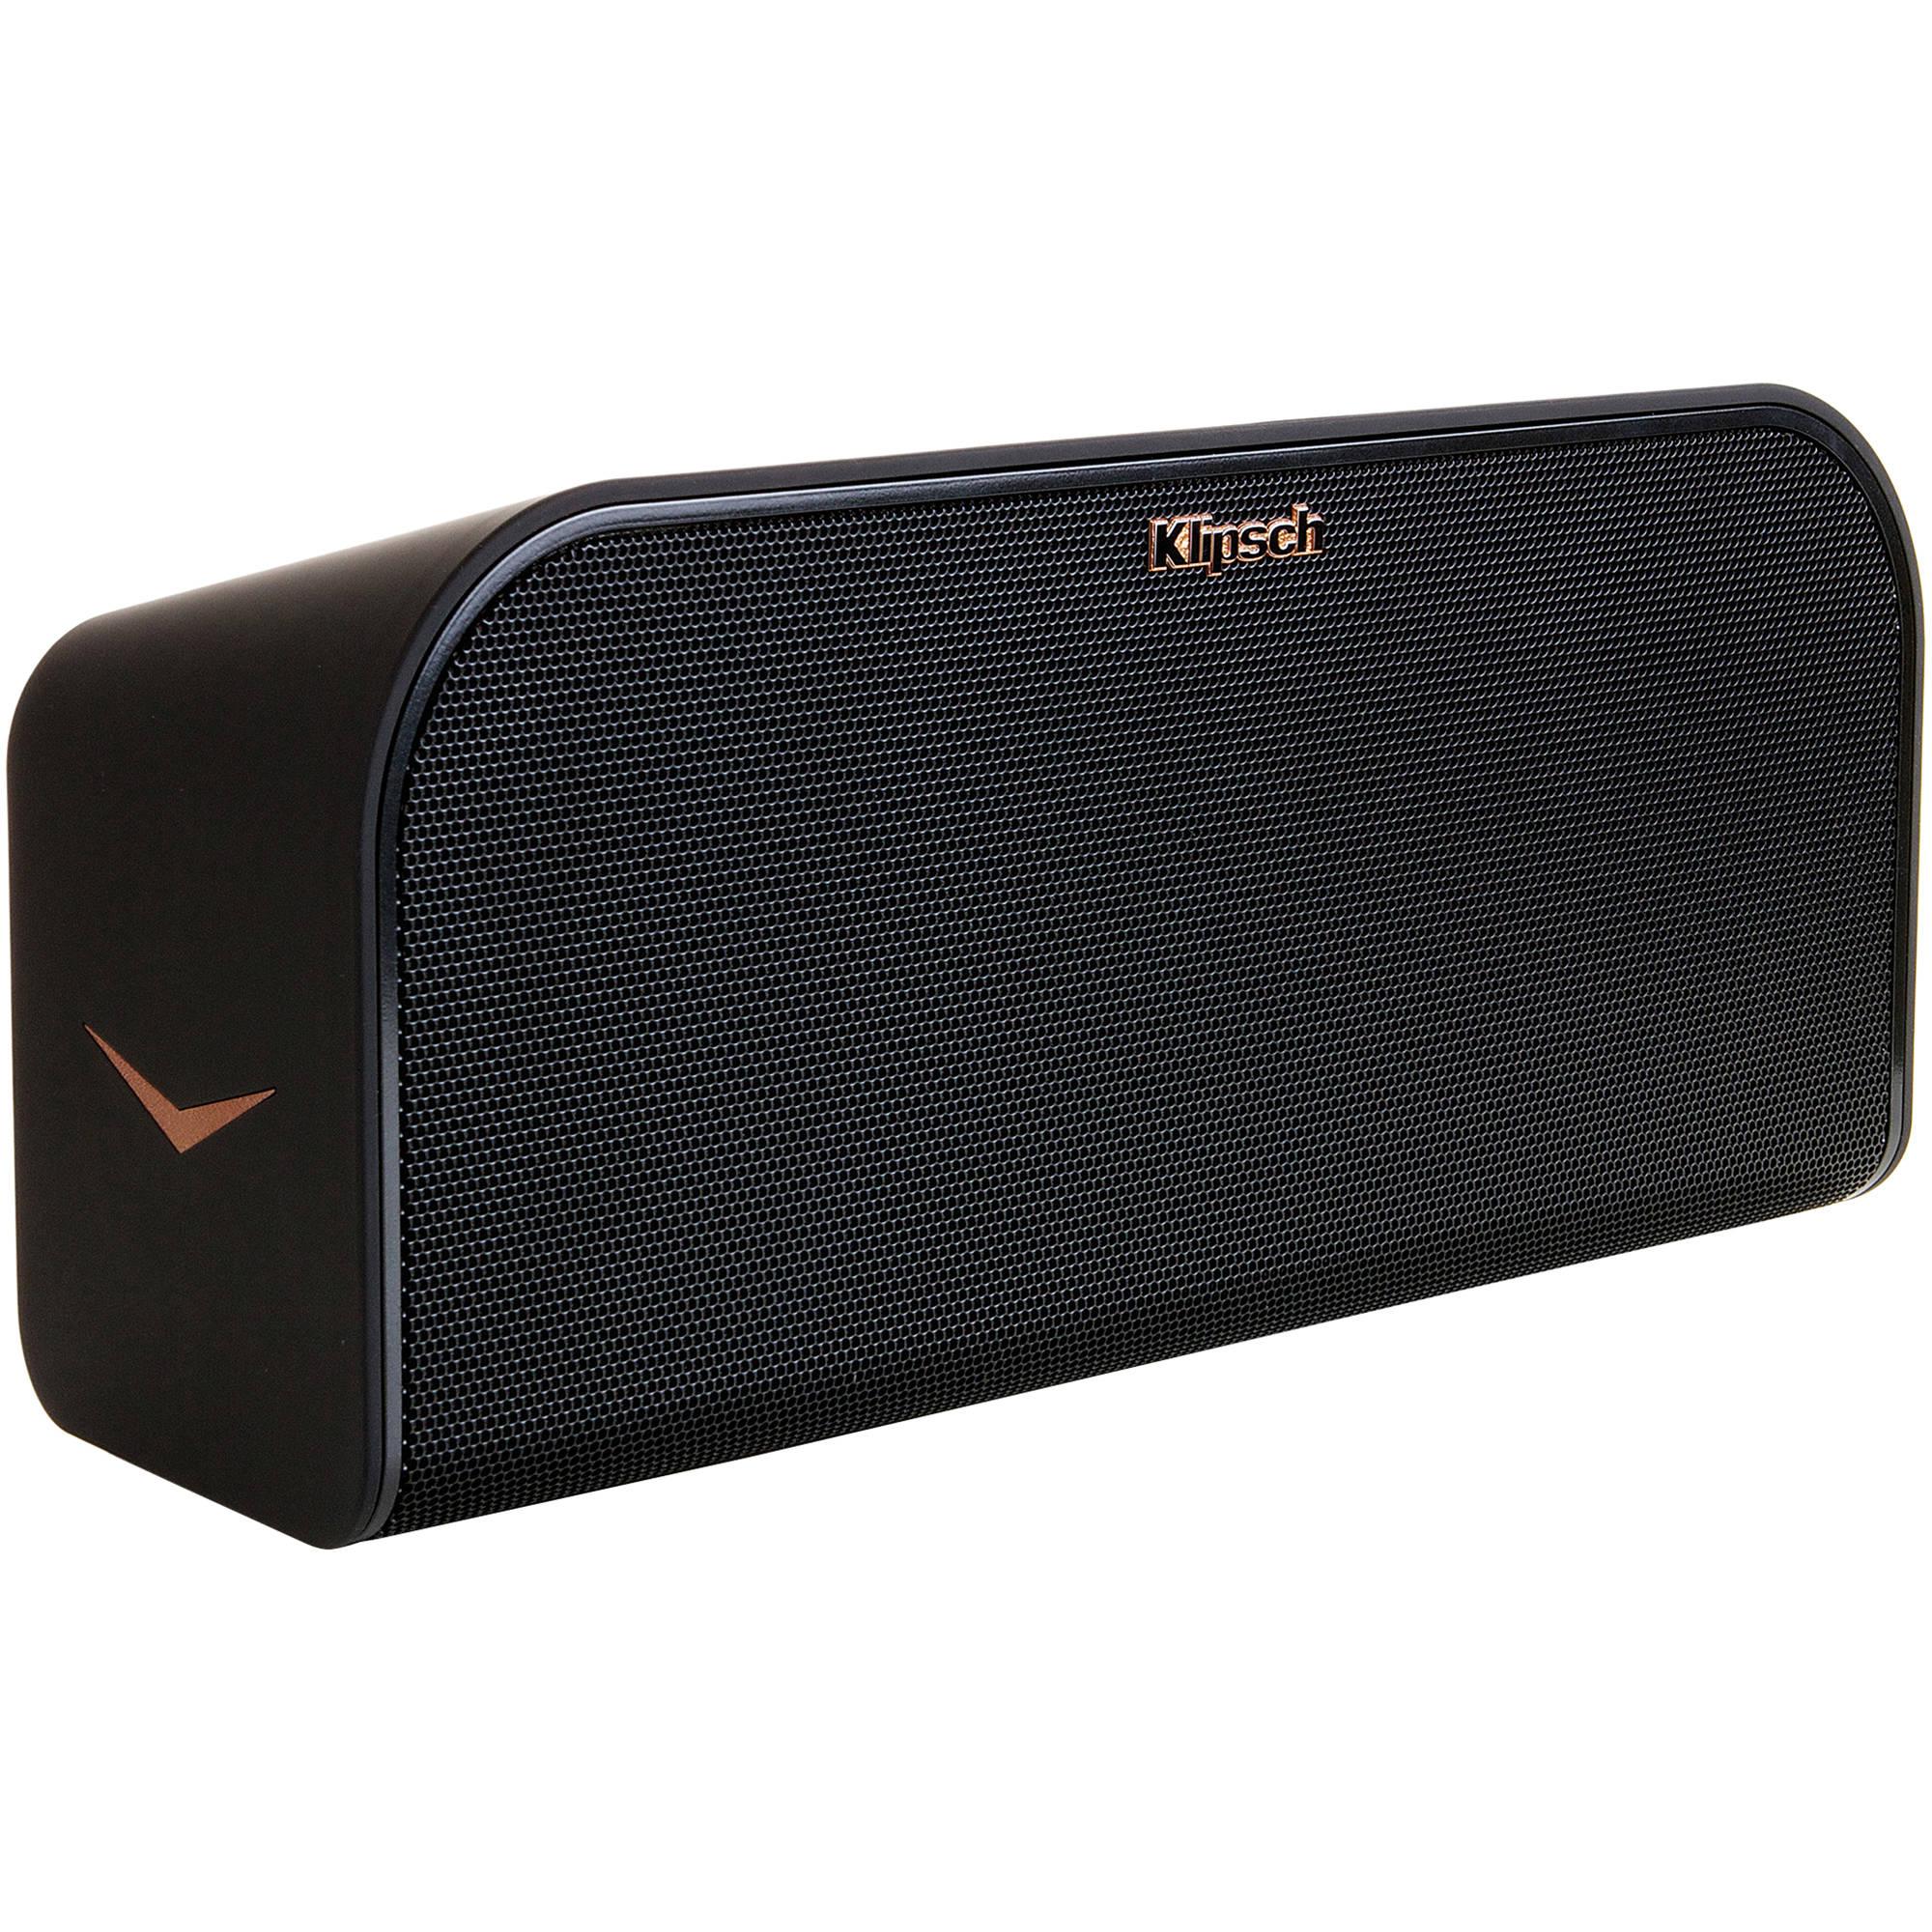 klipsch 1016050 kmc 3 2 1 wireless home music system 1016050 b h. Black Bedroom Furniture Sets. Home Design Ideas